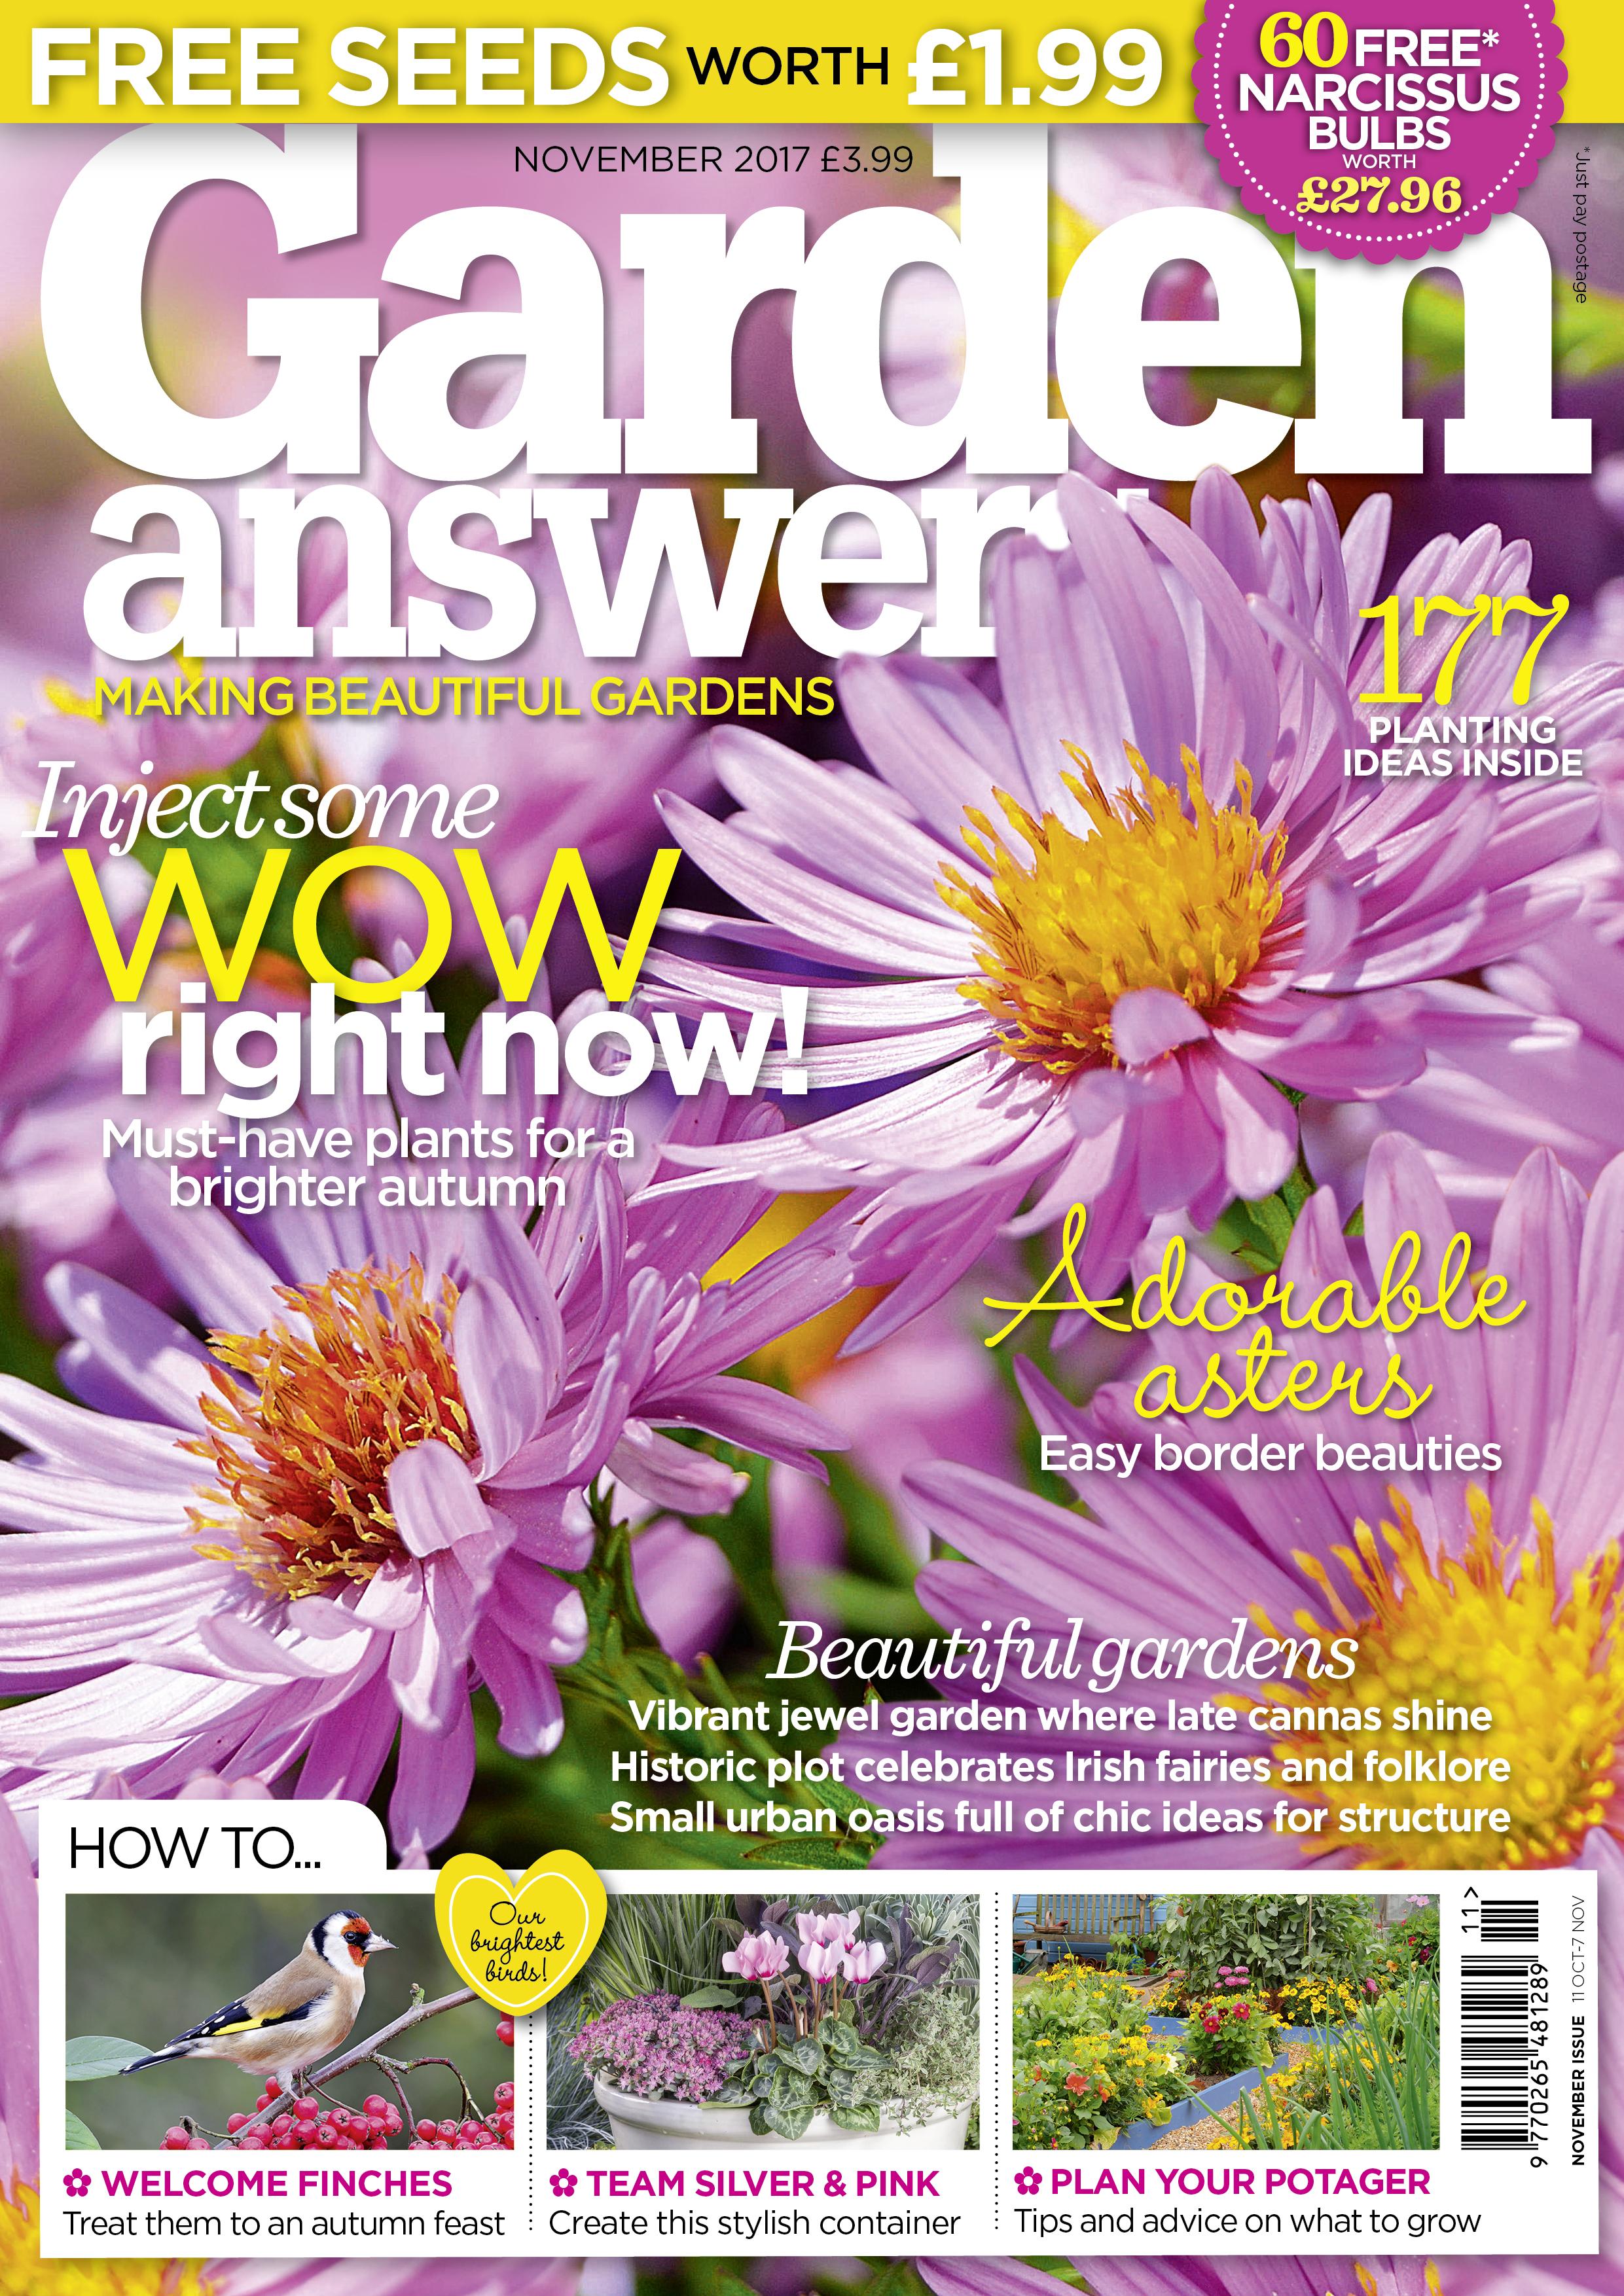 12 GA Nov 2017 newsstand.jpg